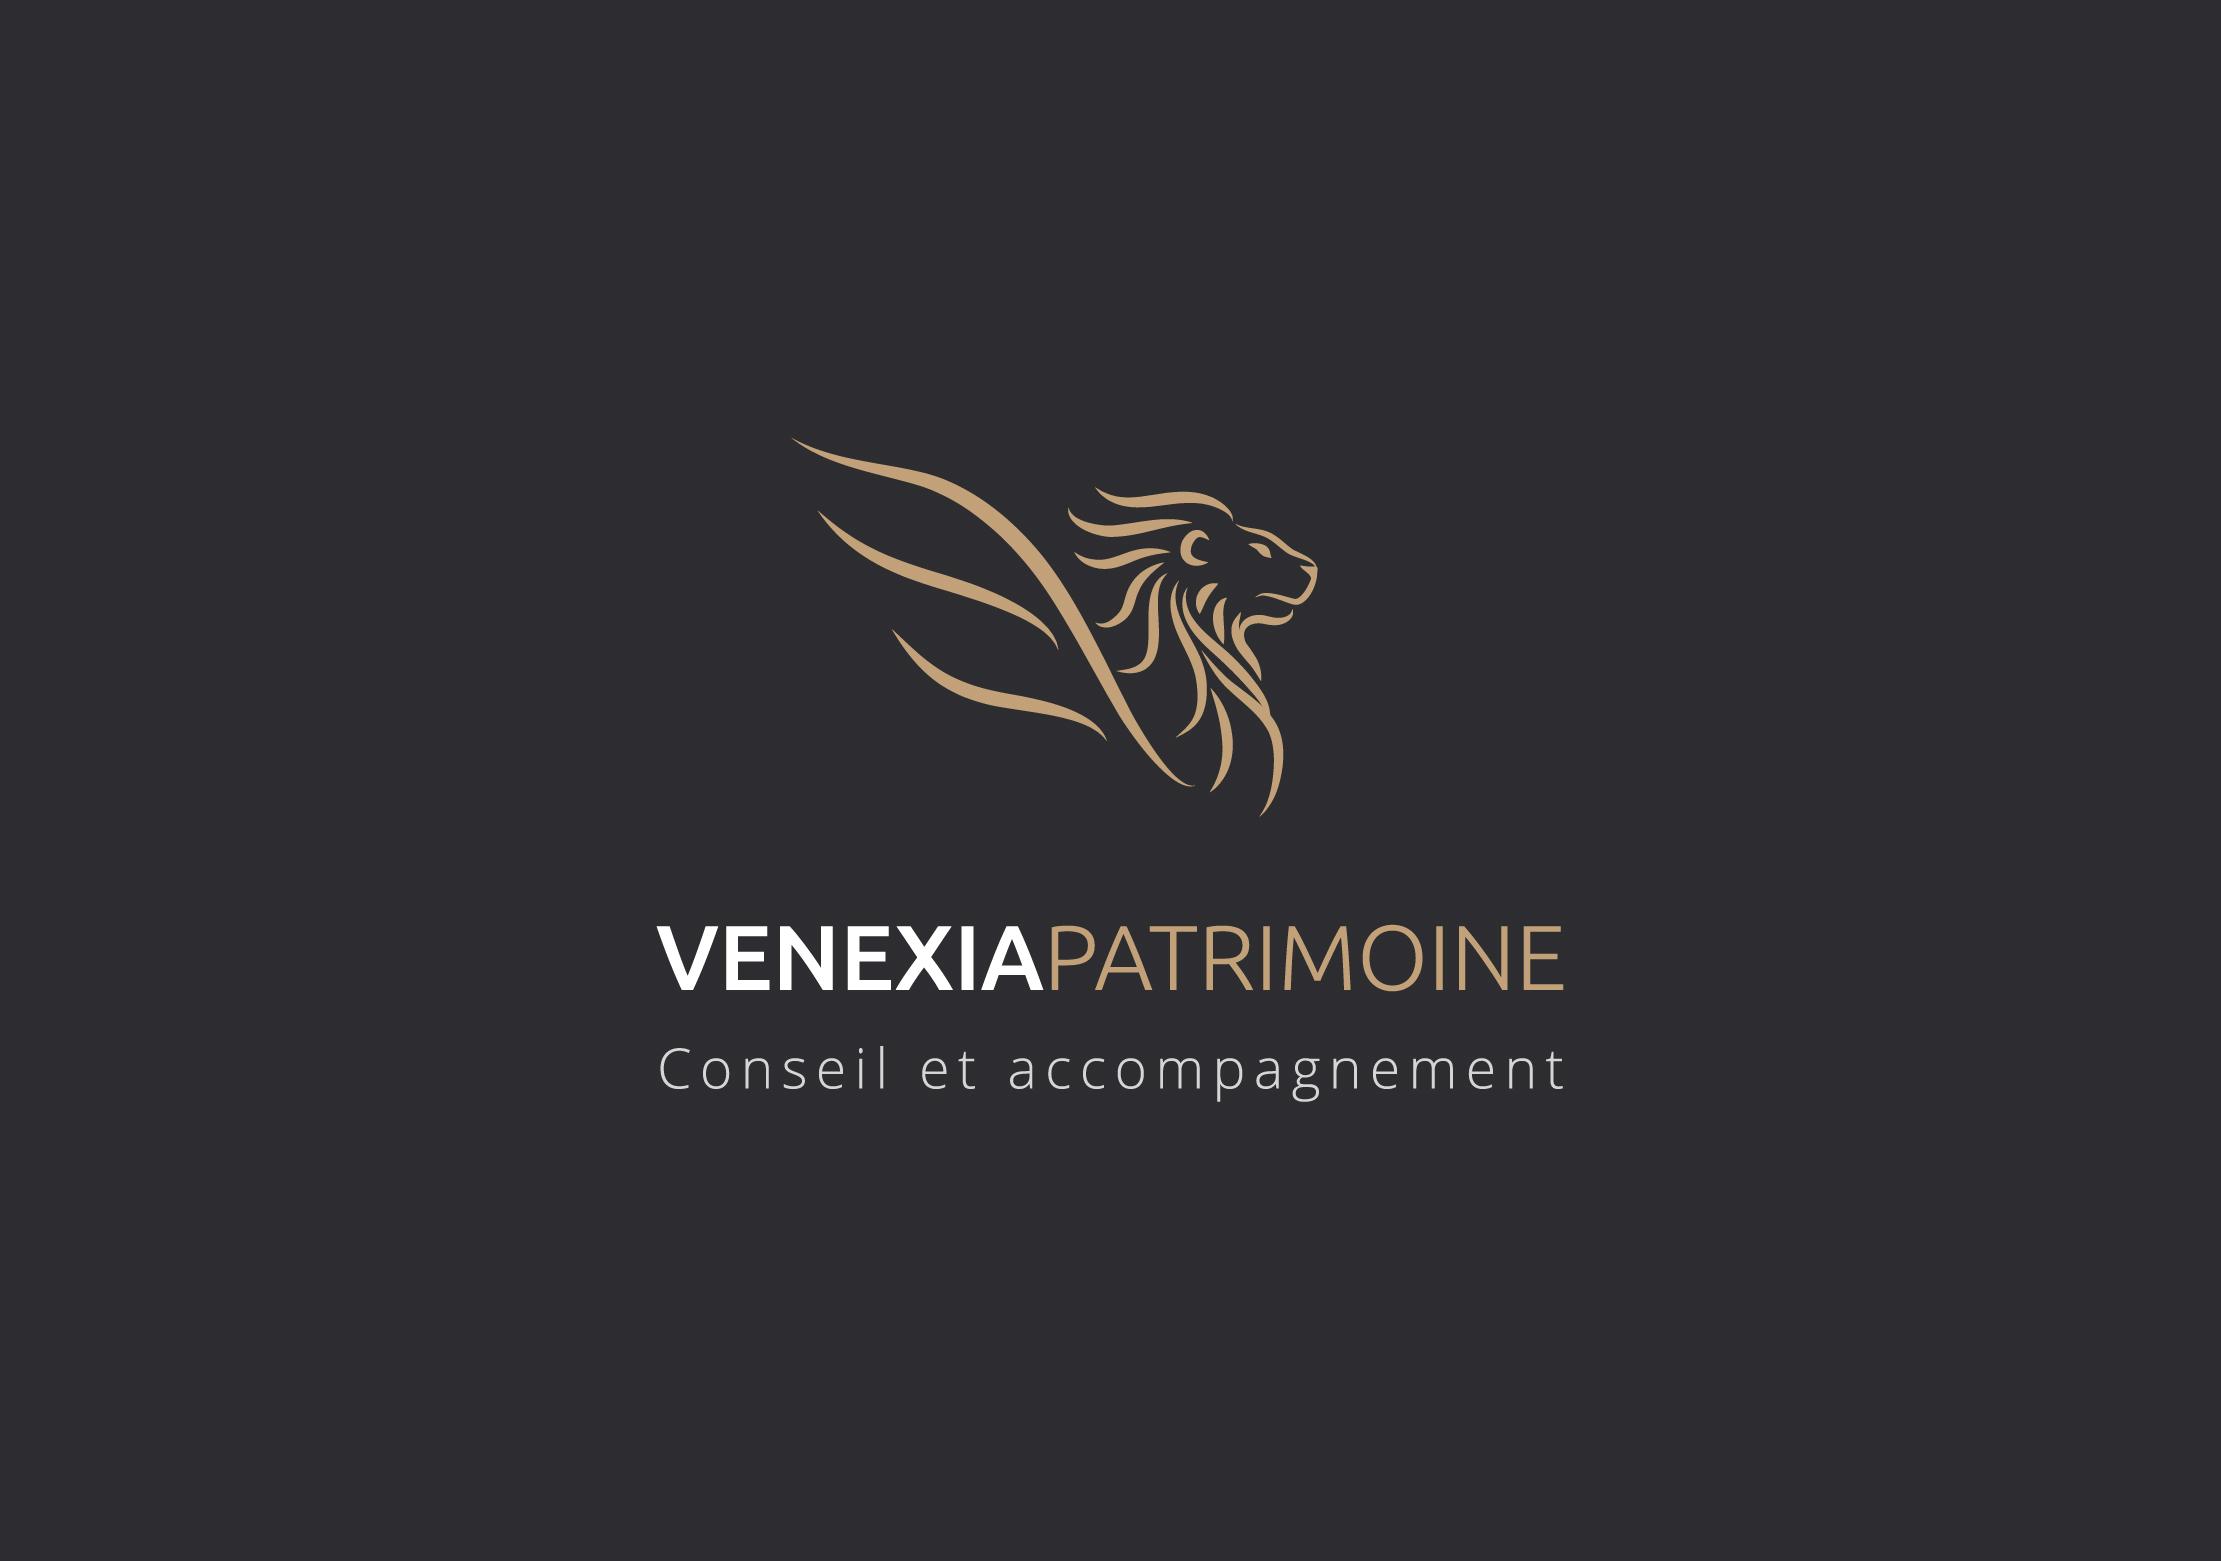 VENEXIA PATRIMOINE